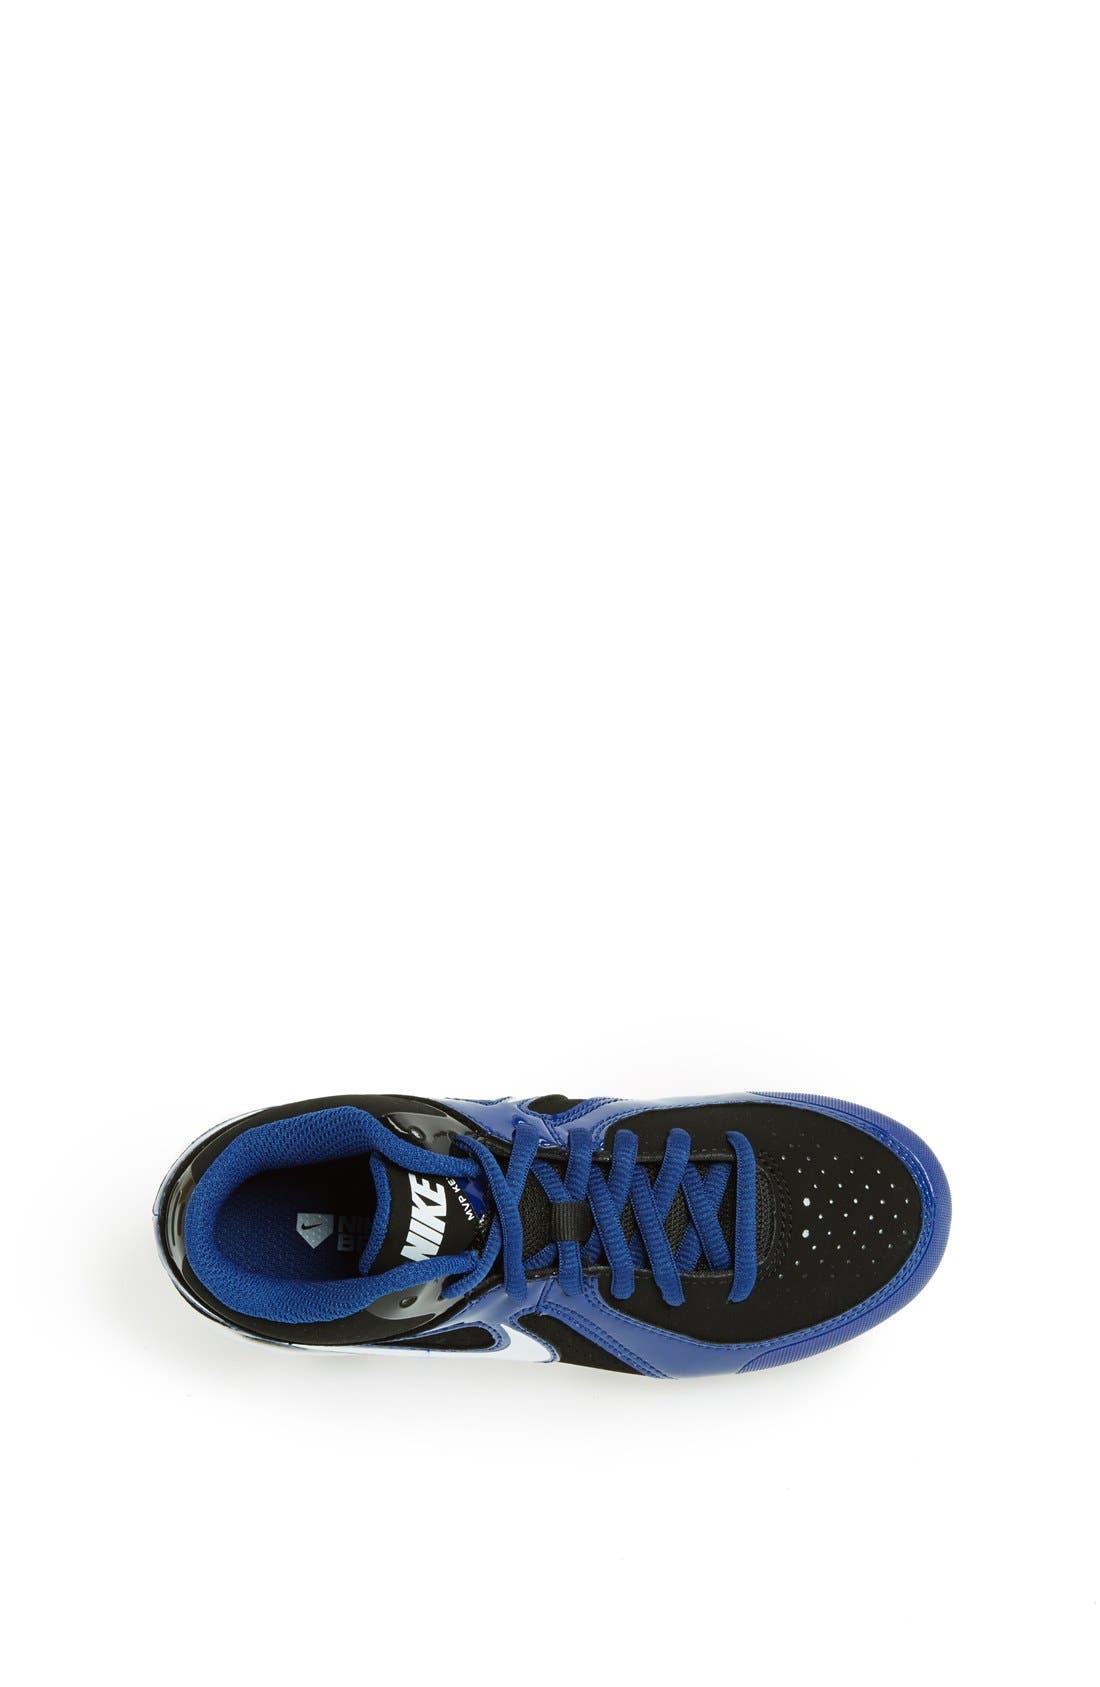 Alternate Image 3  - Nike 'MVP Keystone 3/4' Baseball Cleat (Toddler, Little Kid & Big Kid)